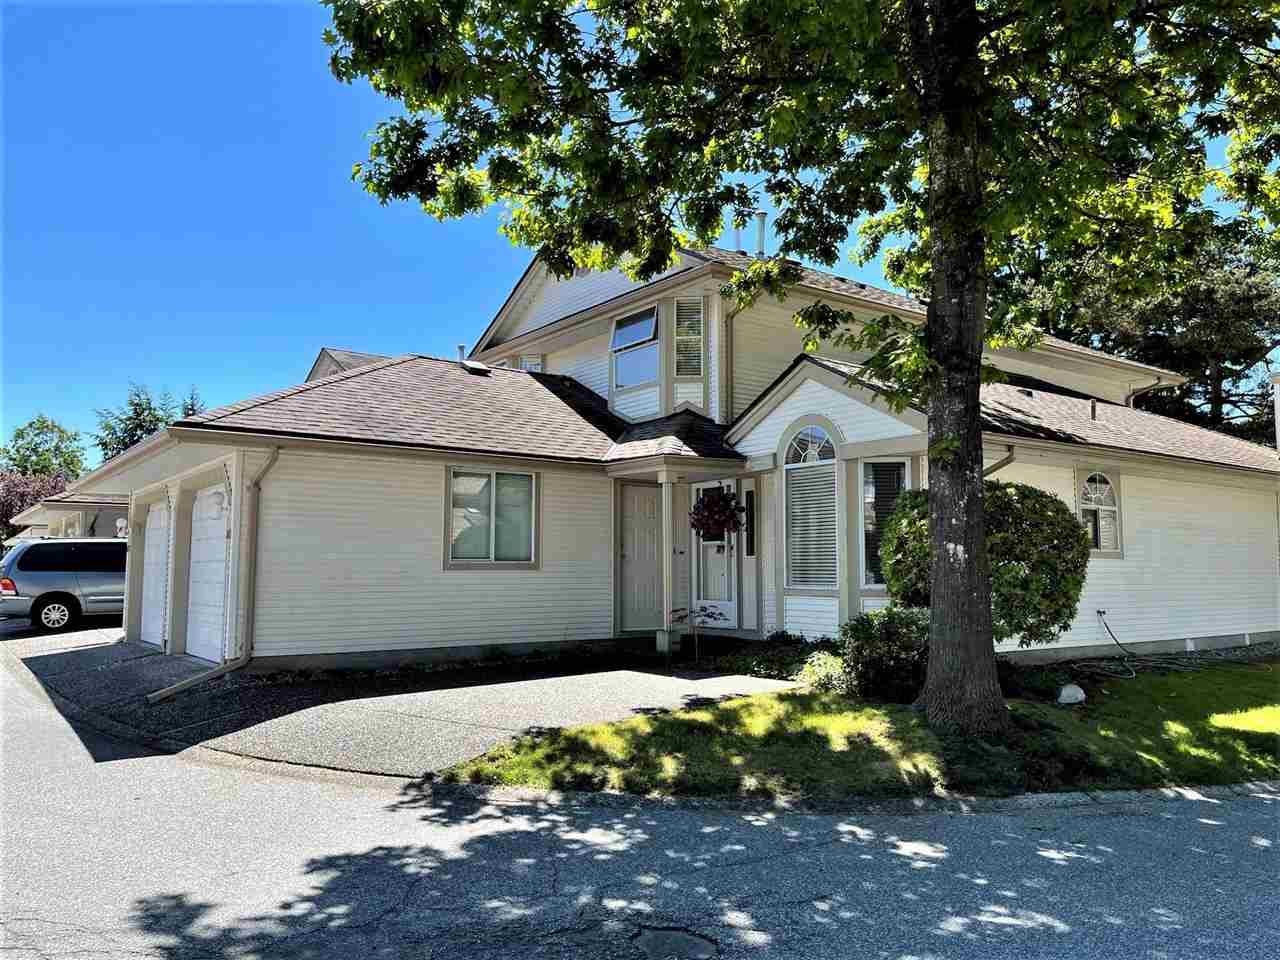 104 9045 WALNUT GROVE DRIVE - Walnut Grove Townhouse for sale, 3 Bedrooms (R2588351) #40